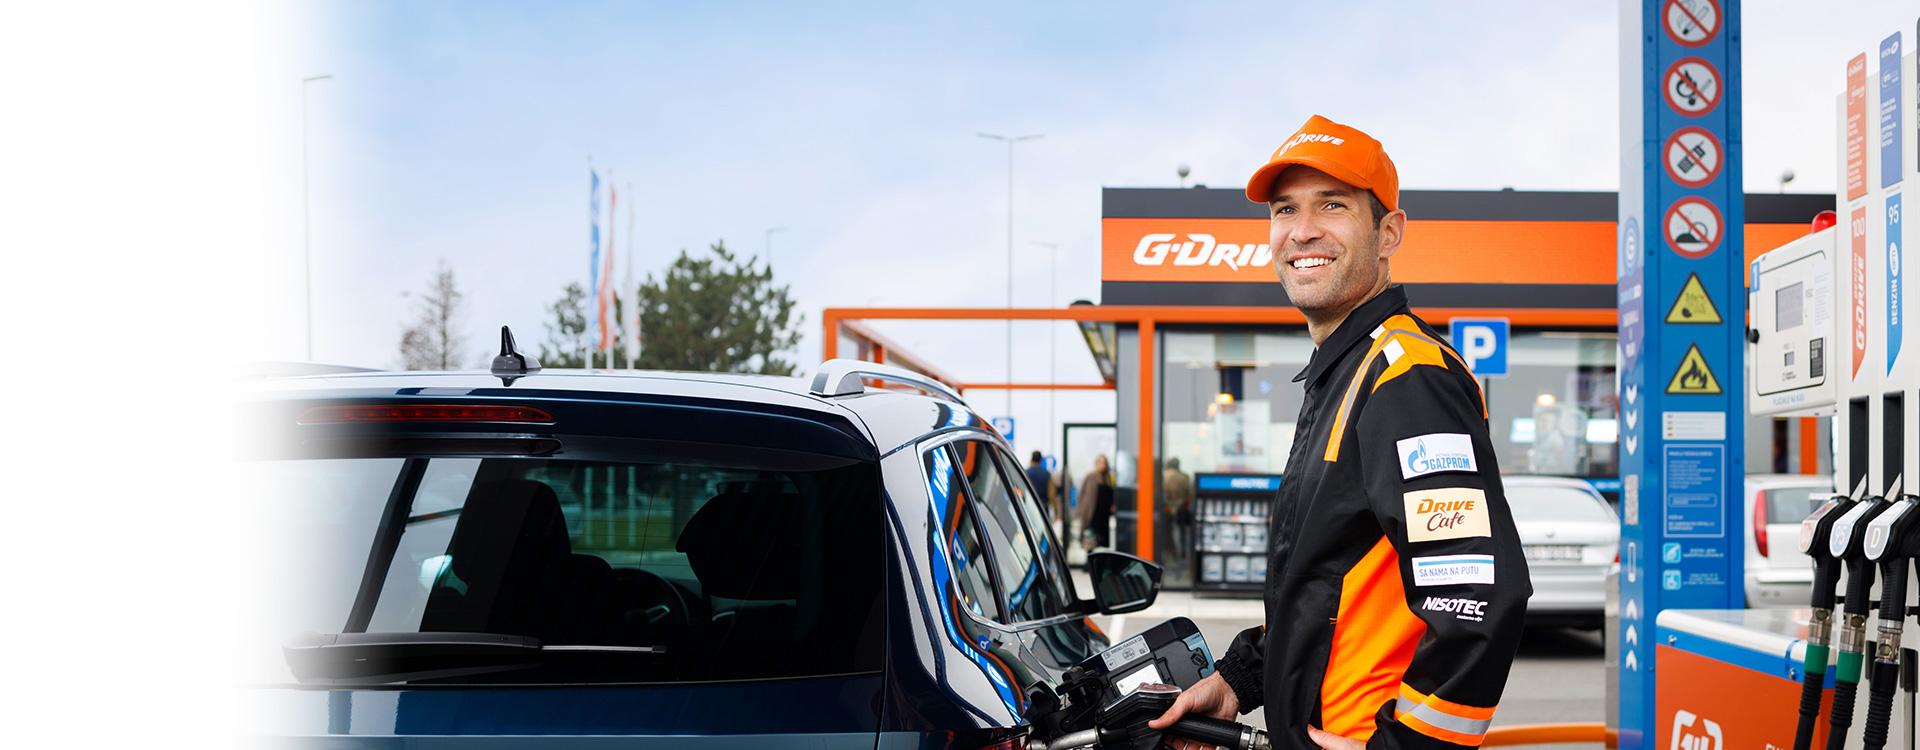 employee at the gazprom petrol station